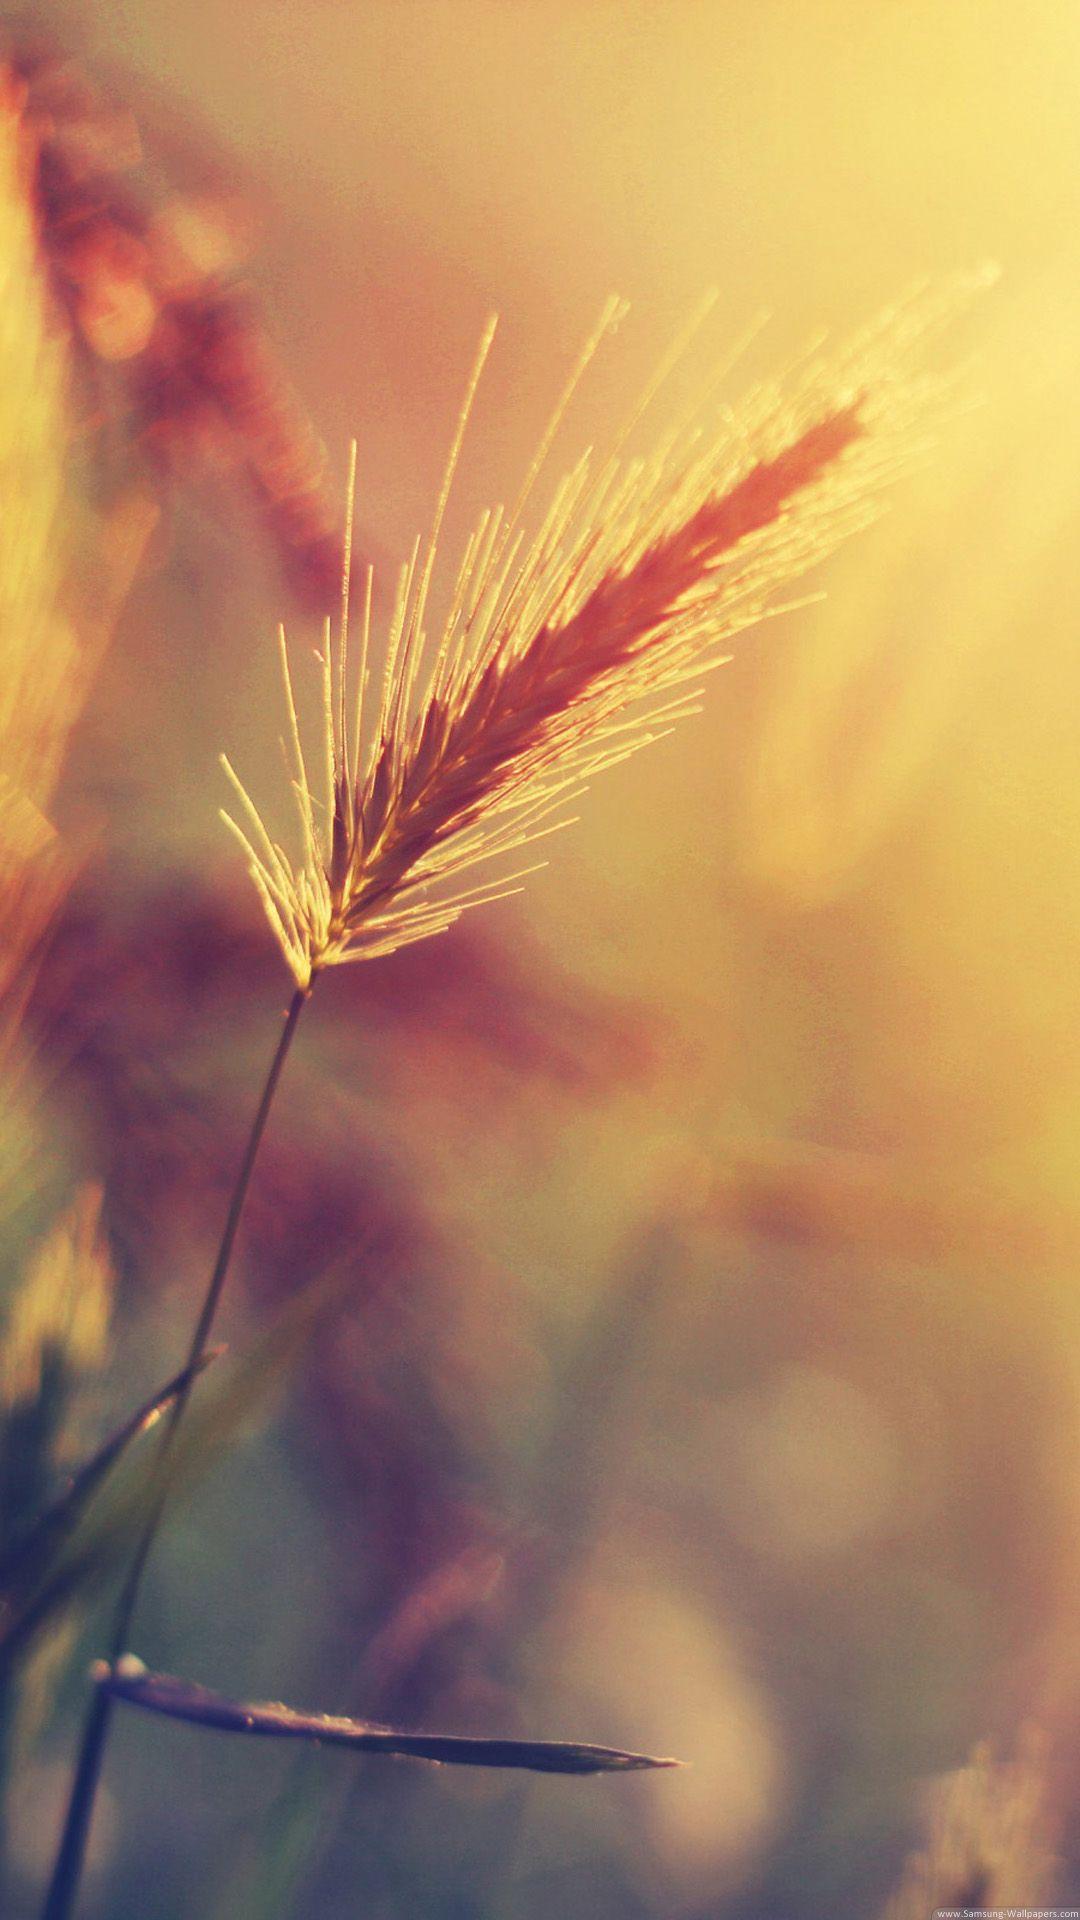 wheat plant closeup iPhone hd wallpaper Ipad air